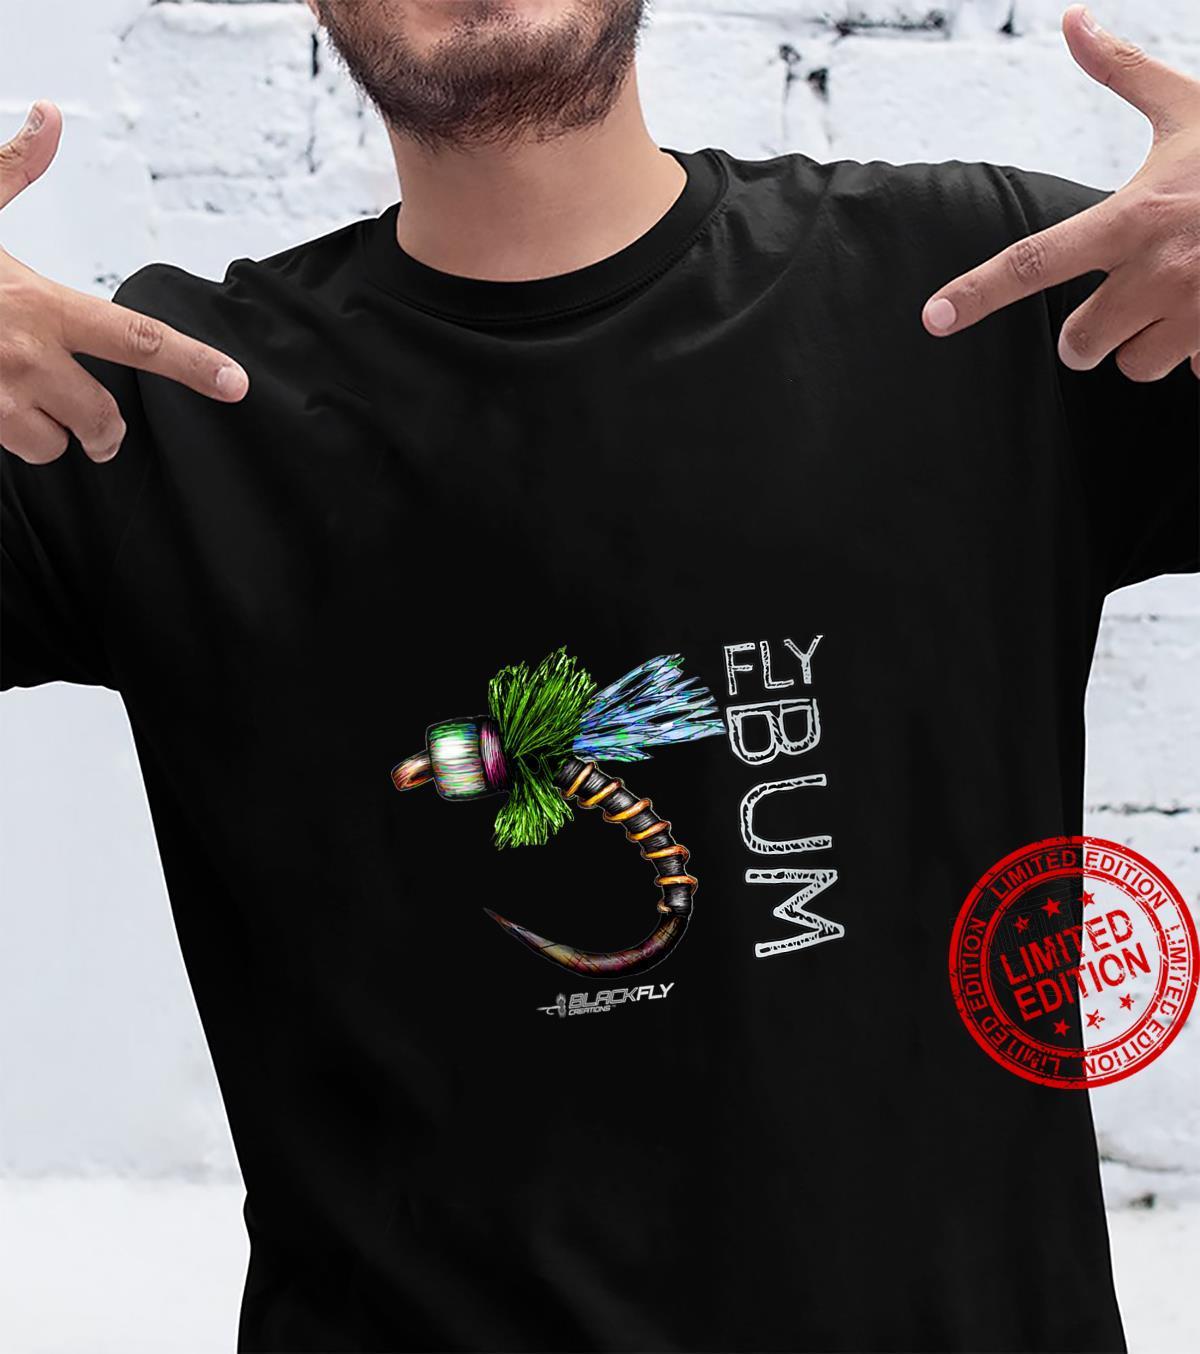 Womens Fly Fishing Apparel Caddis Midge Flies by Black Fly Shirt